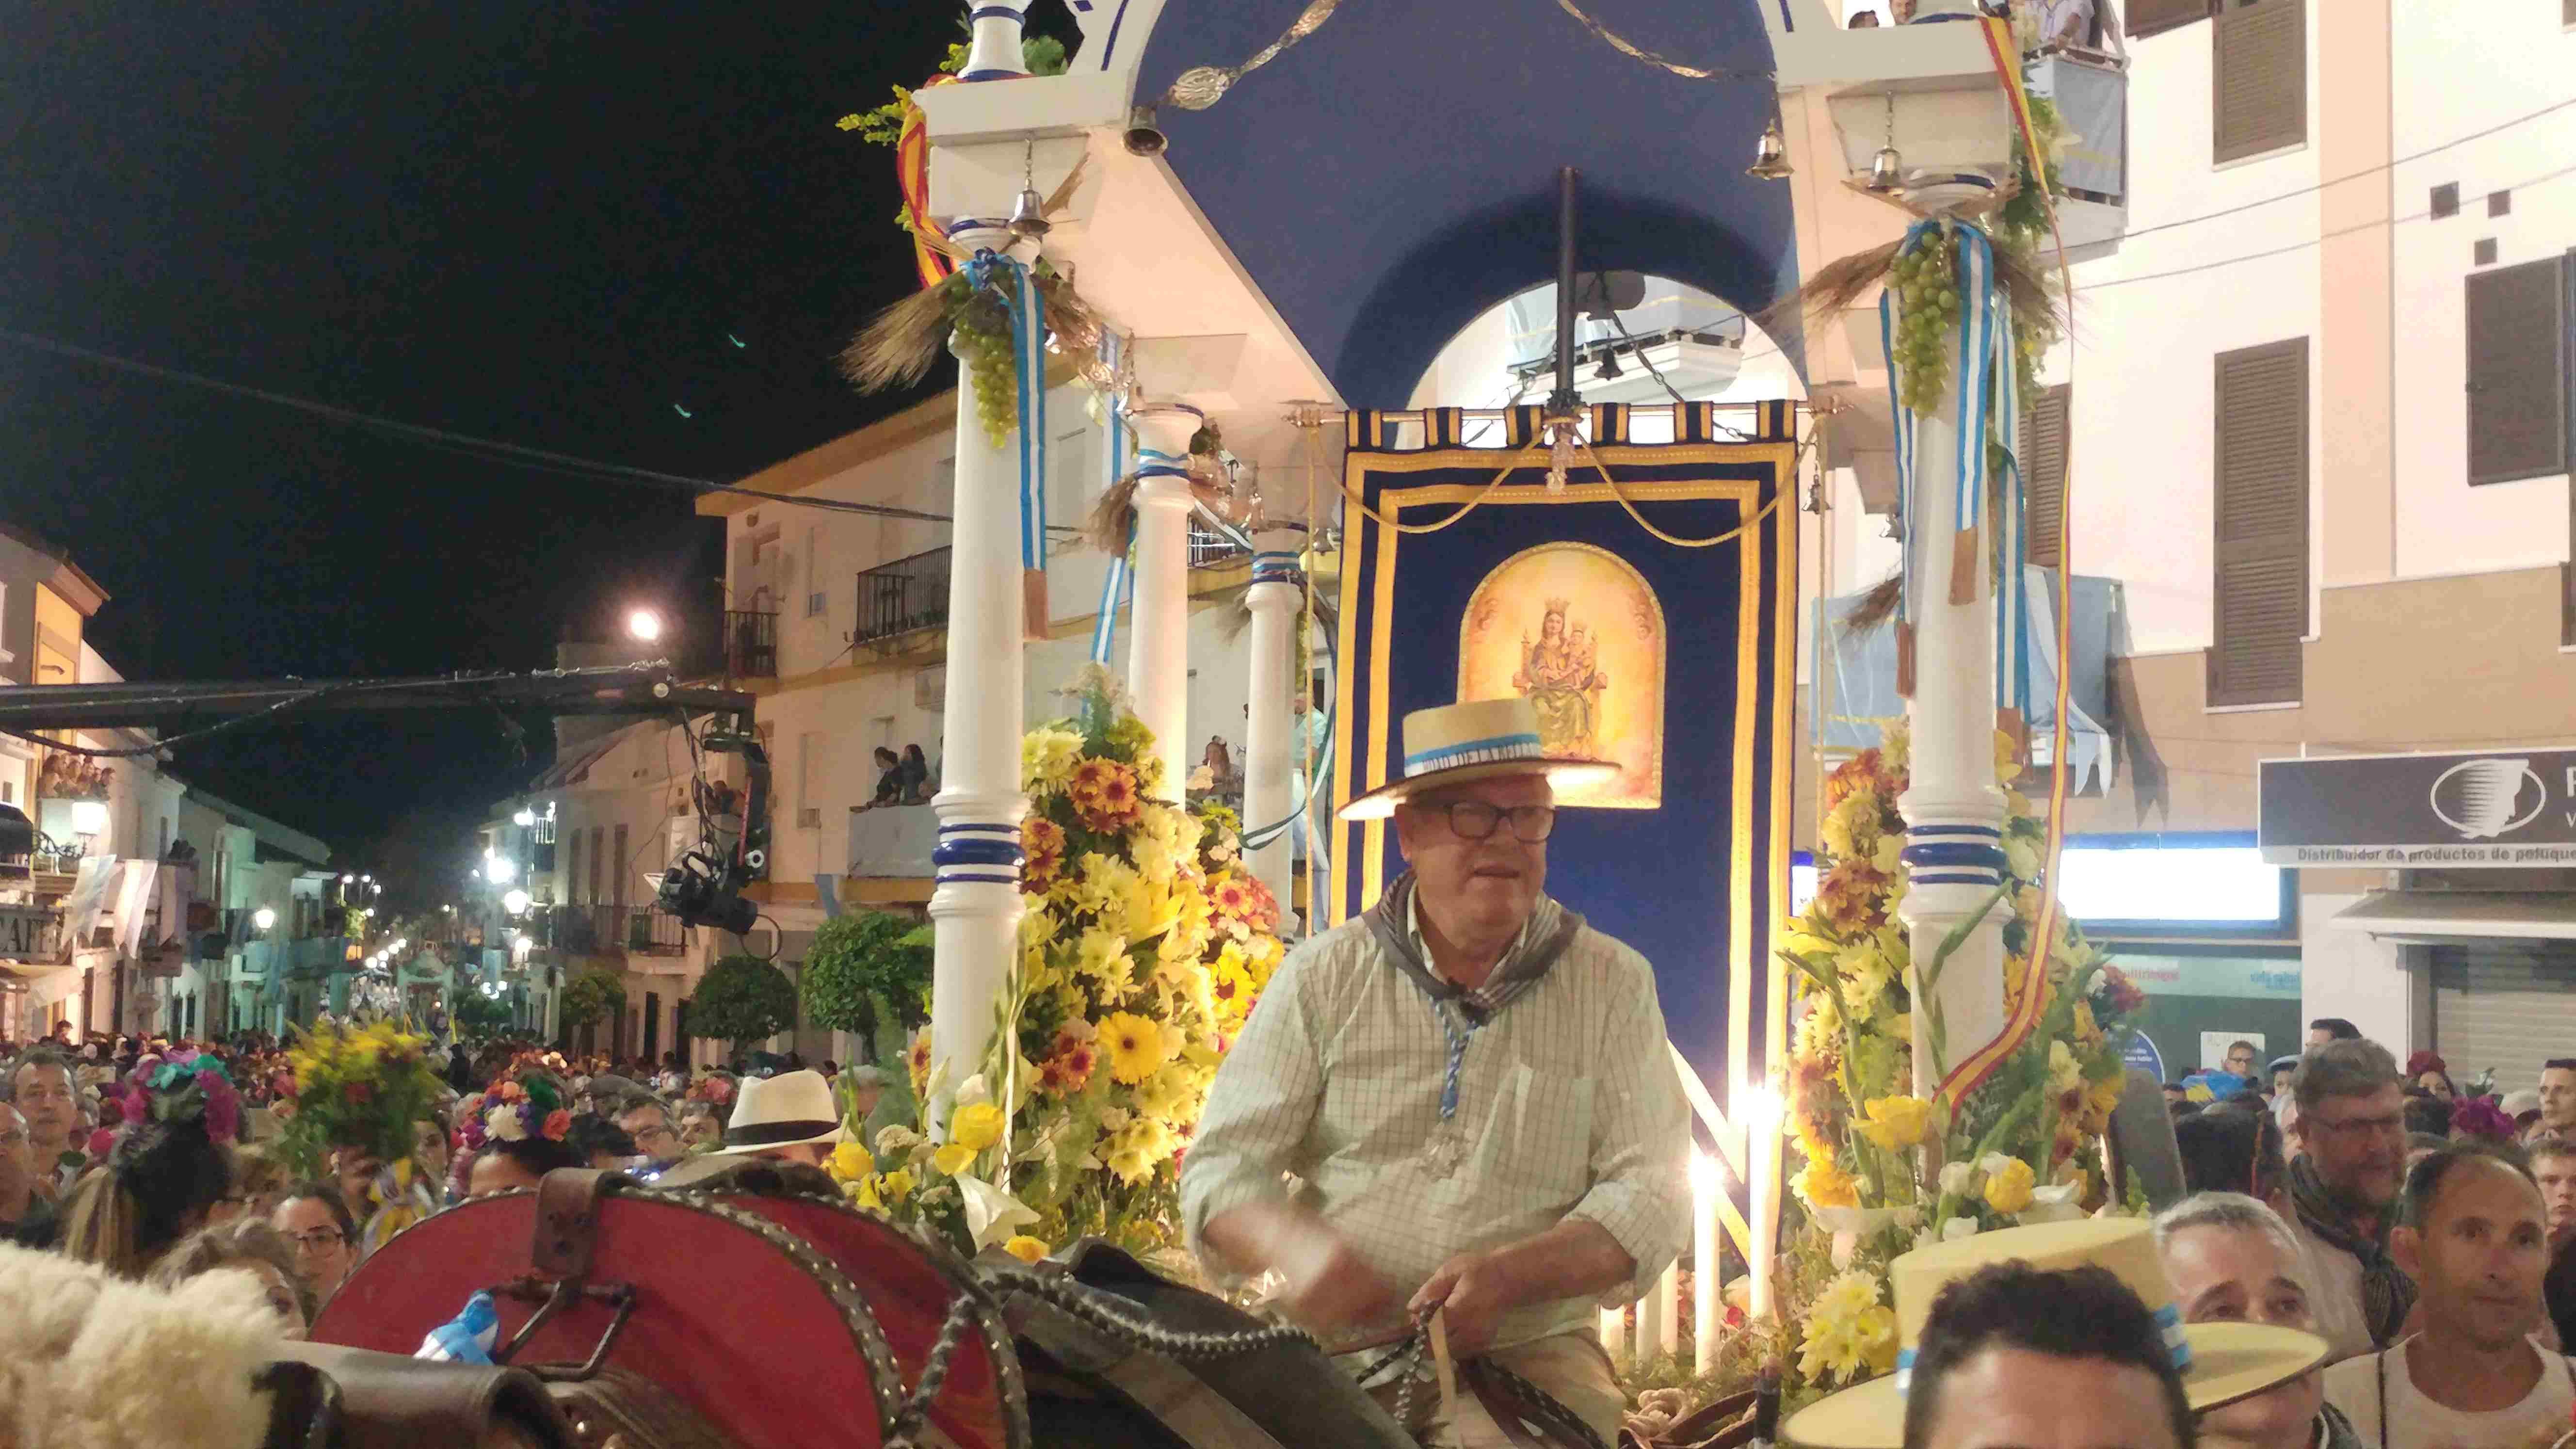 Hermandad de la Bella de Huelva en Lepe 10-05-2019